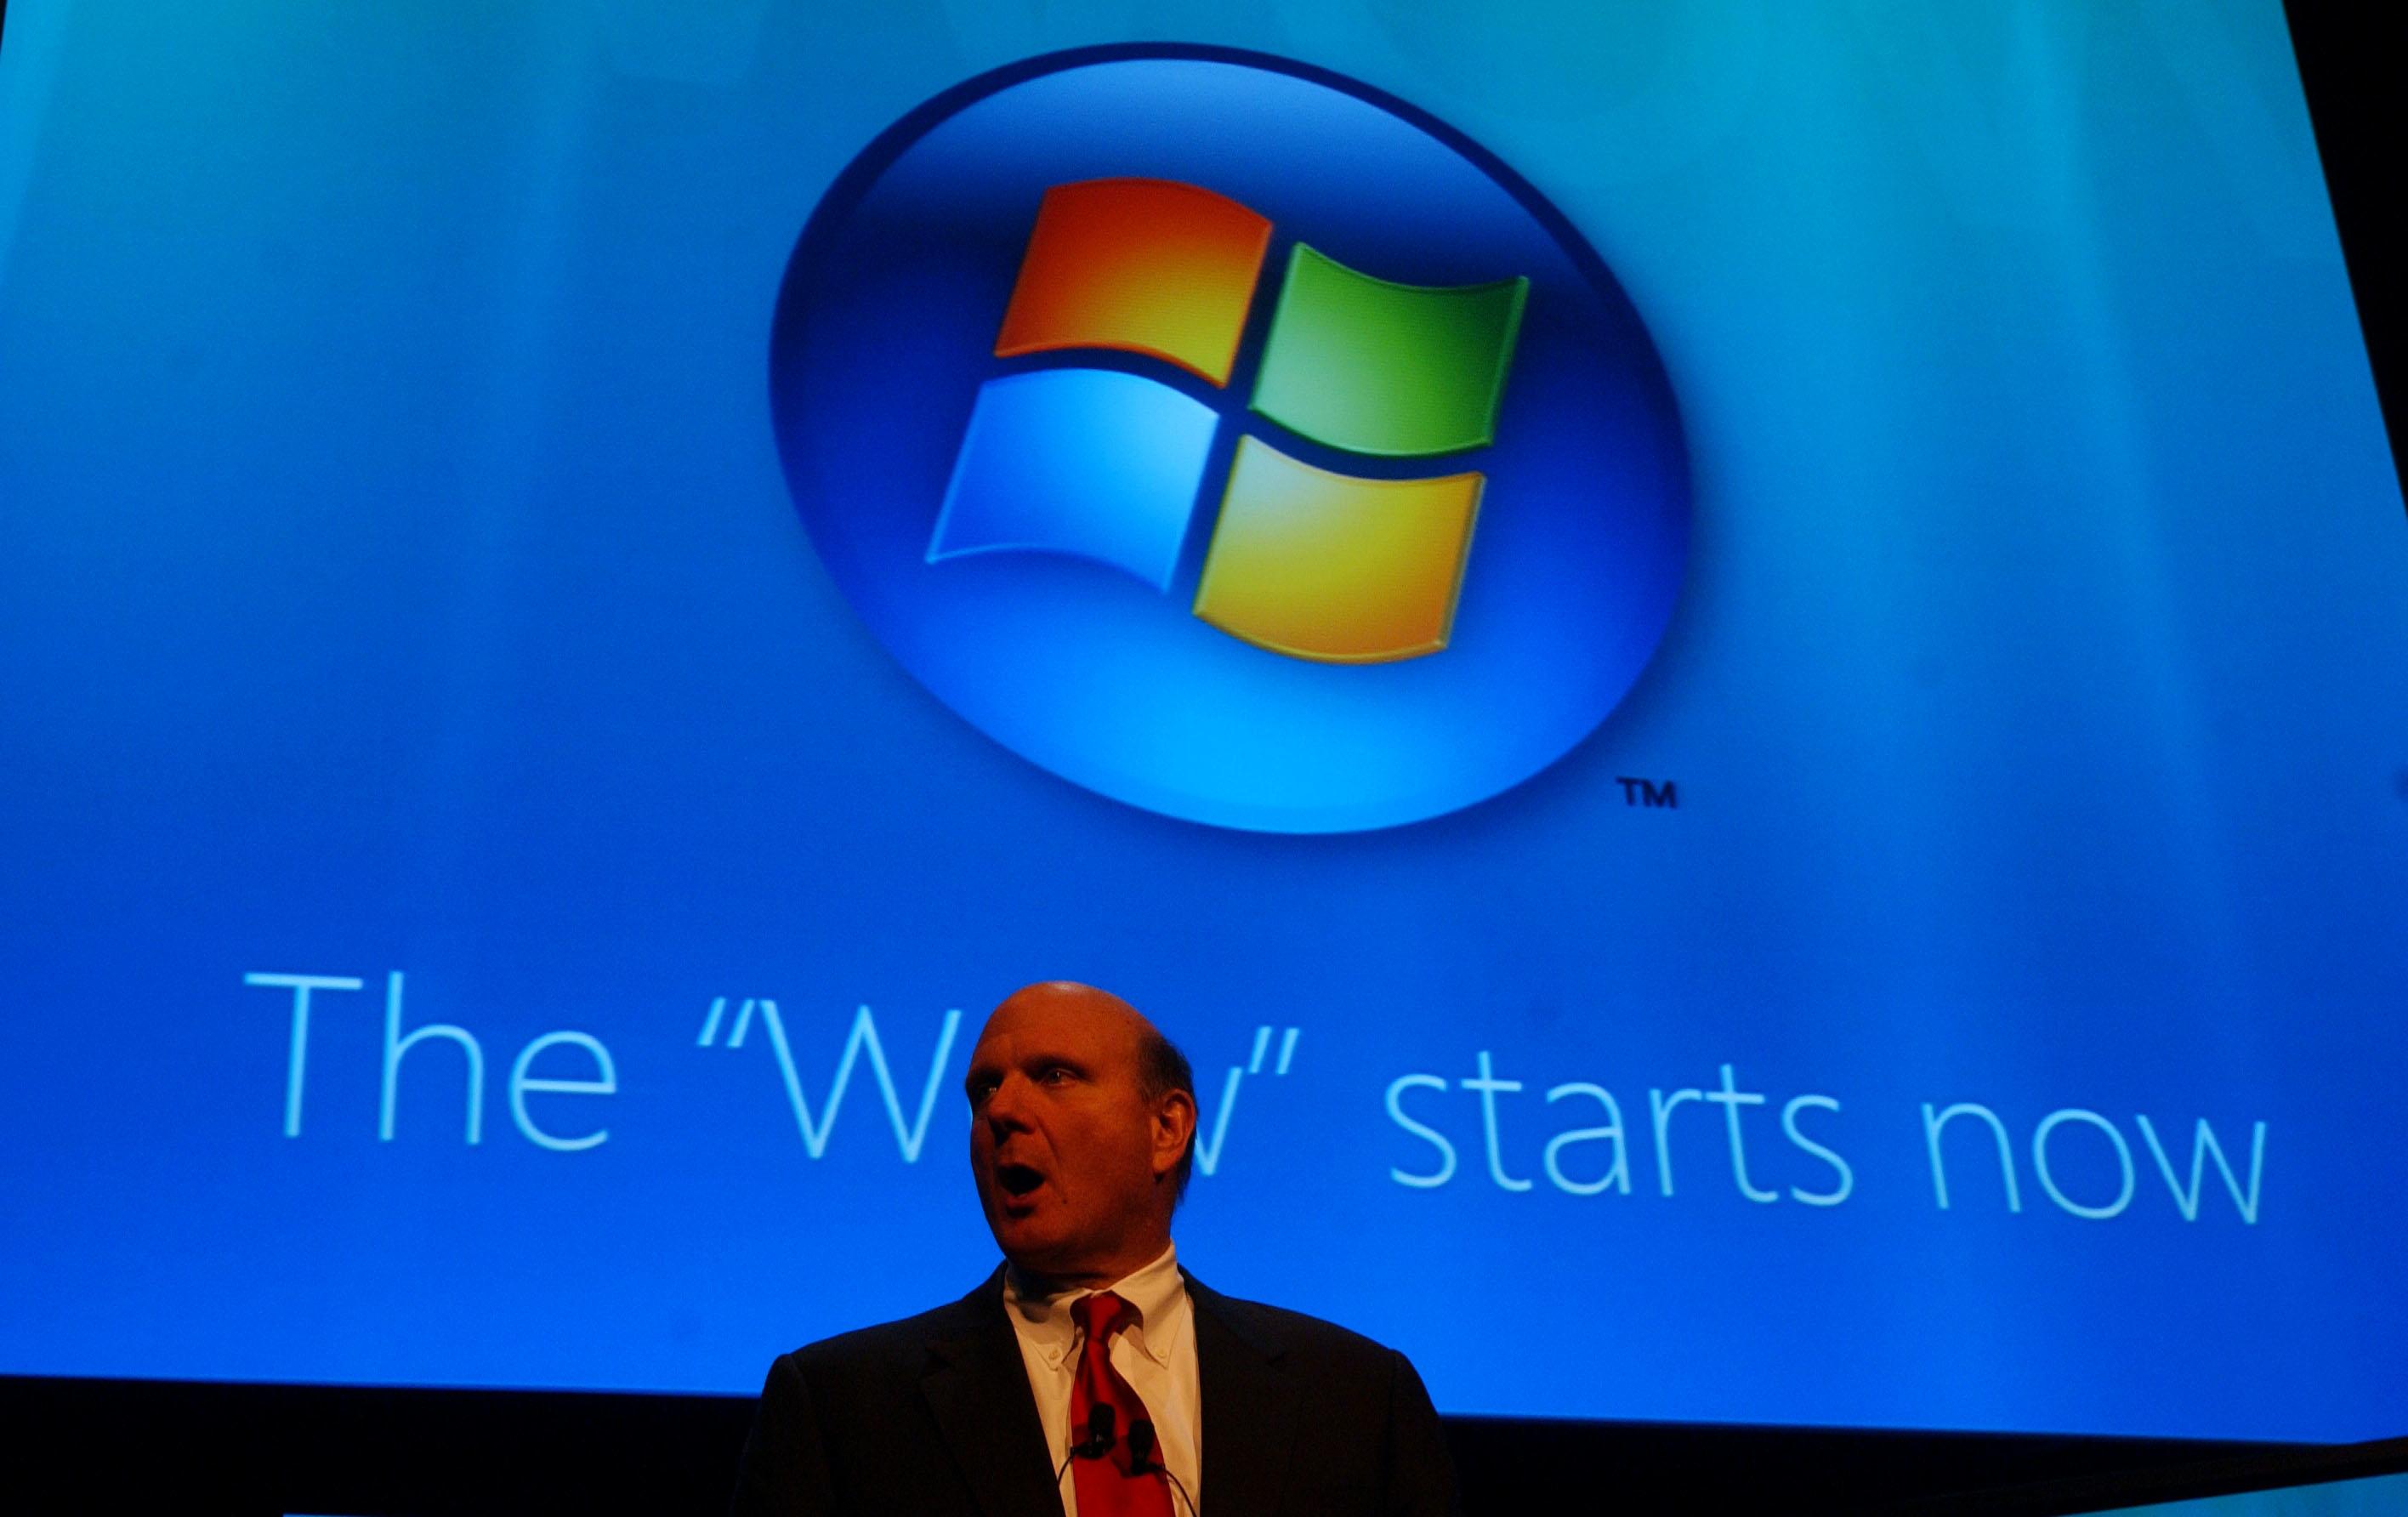 Windows Vista - The